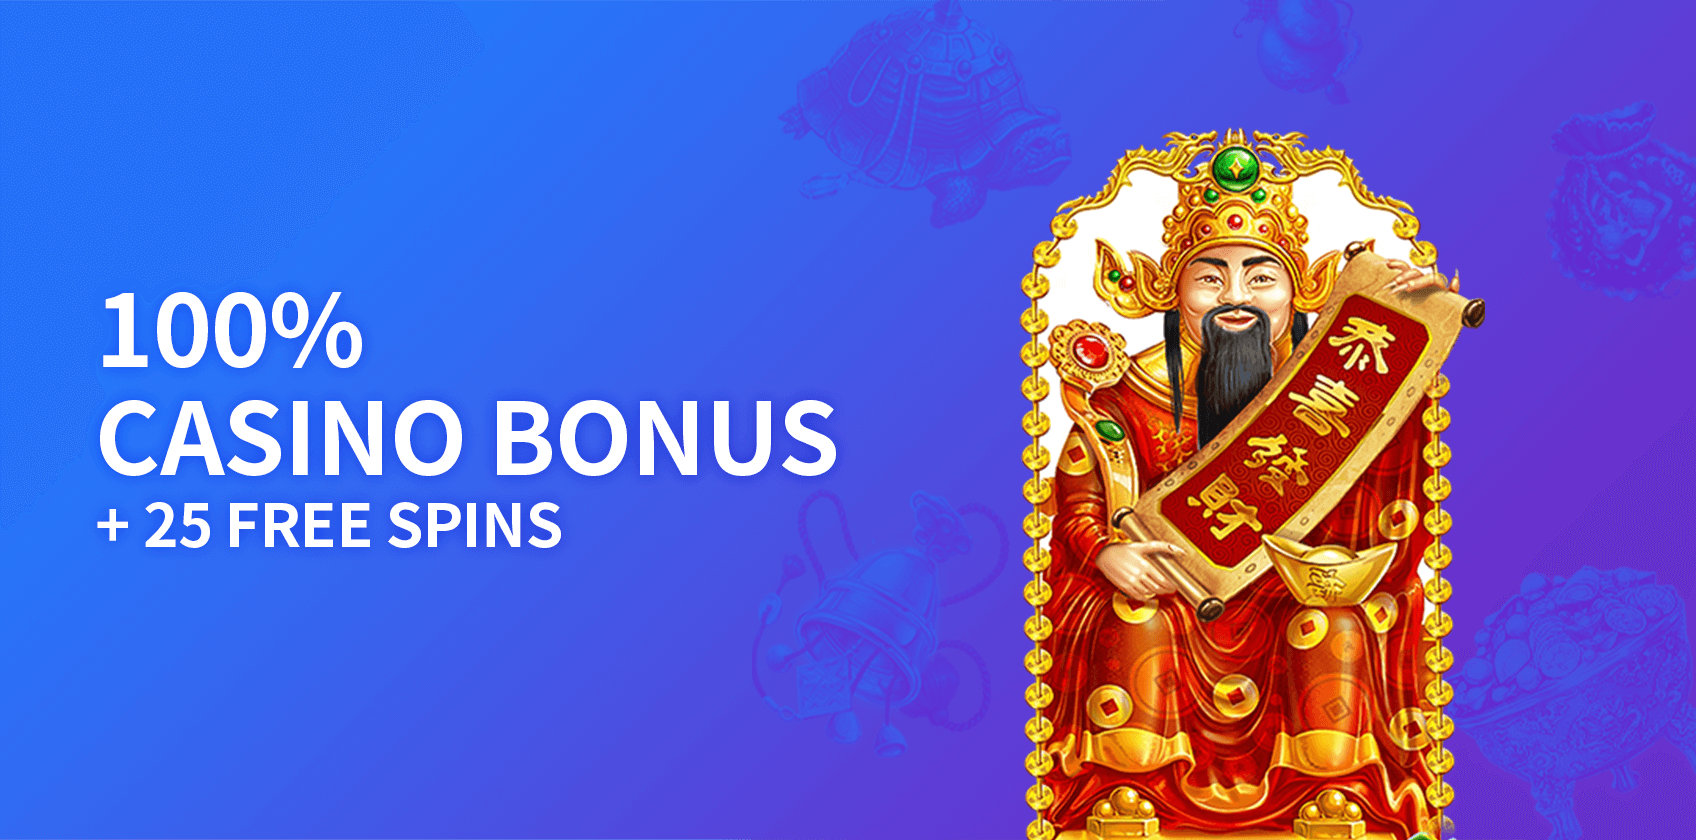 Super Casino 100 Welcome Bonus 25 Free Spins